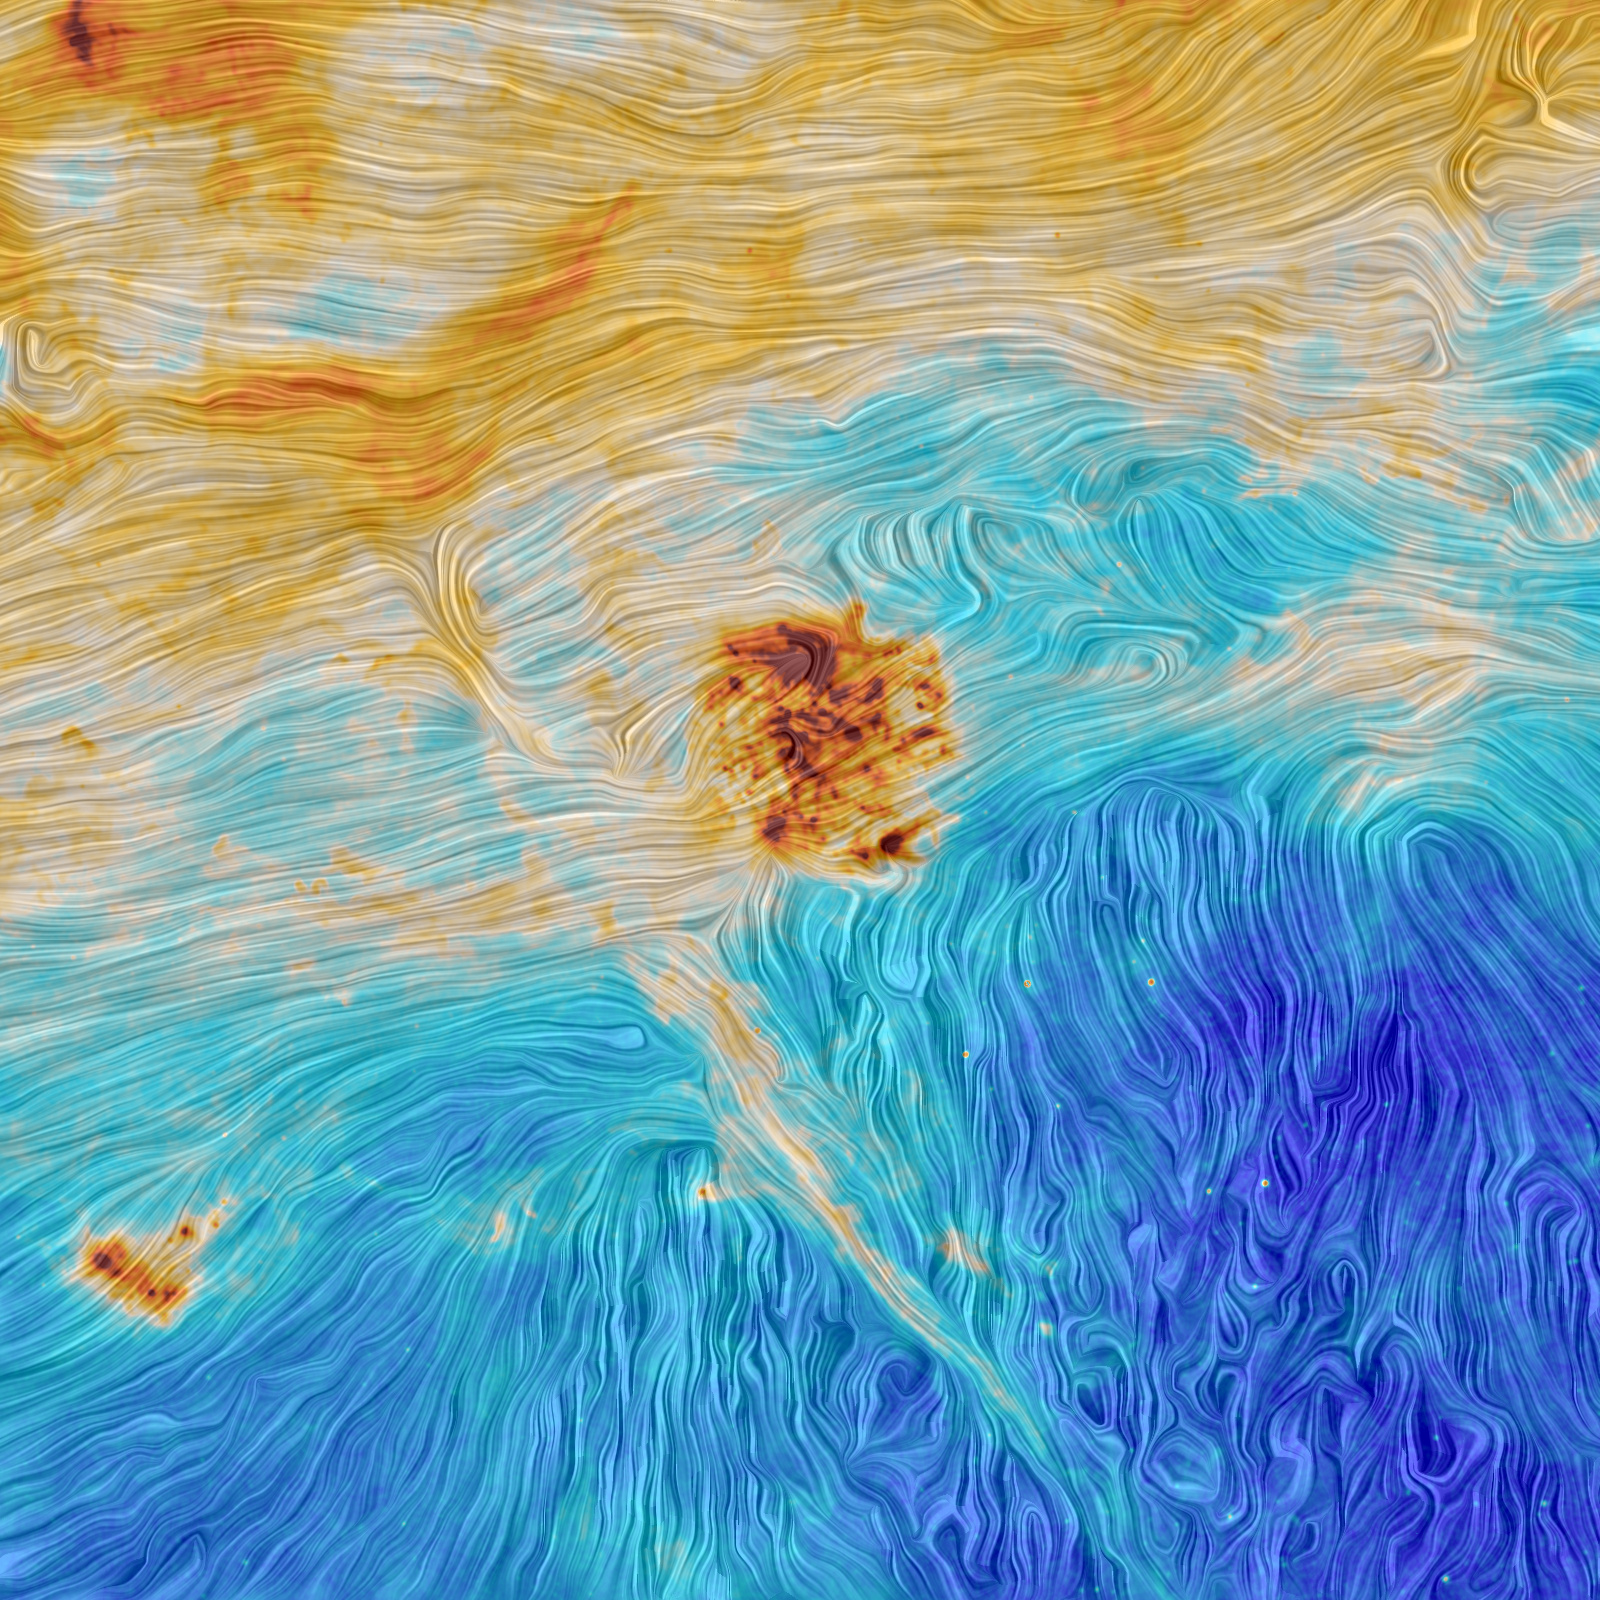 Image credit: © ESA and the Planck Collaboration.